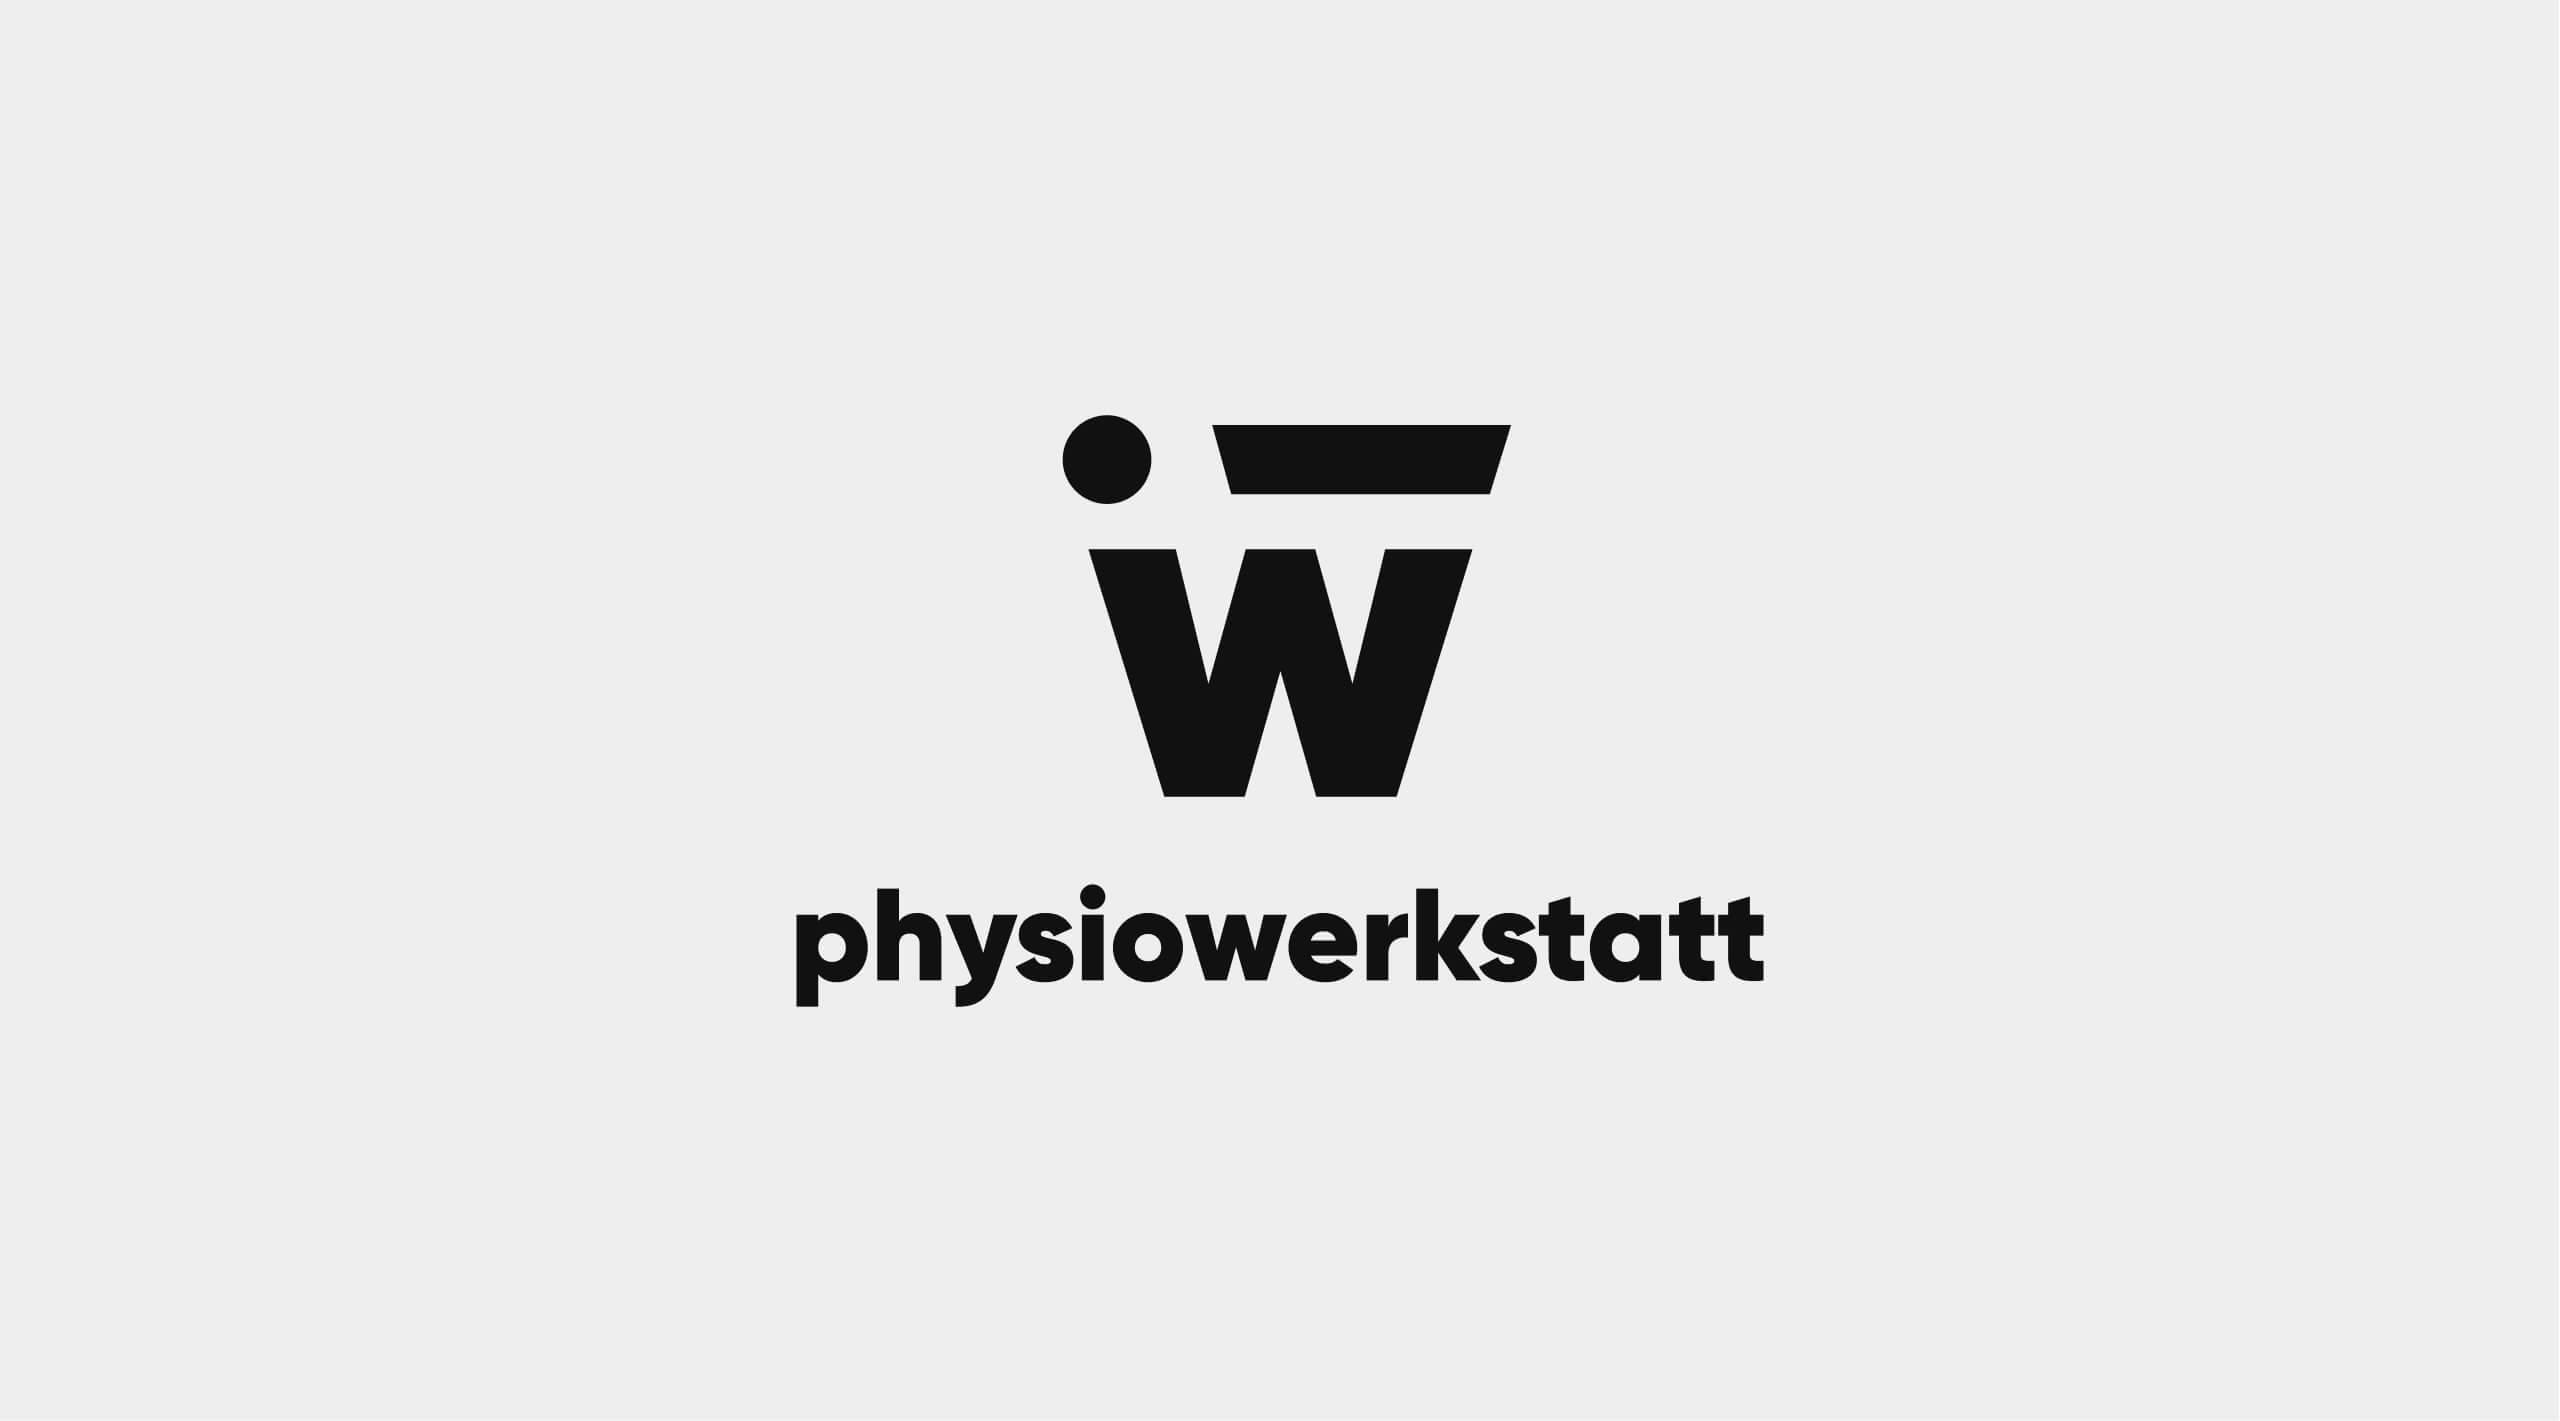 Darstellung des physiowerkstatt Logos.